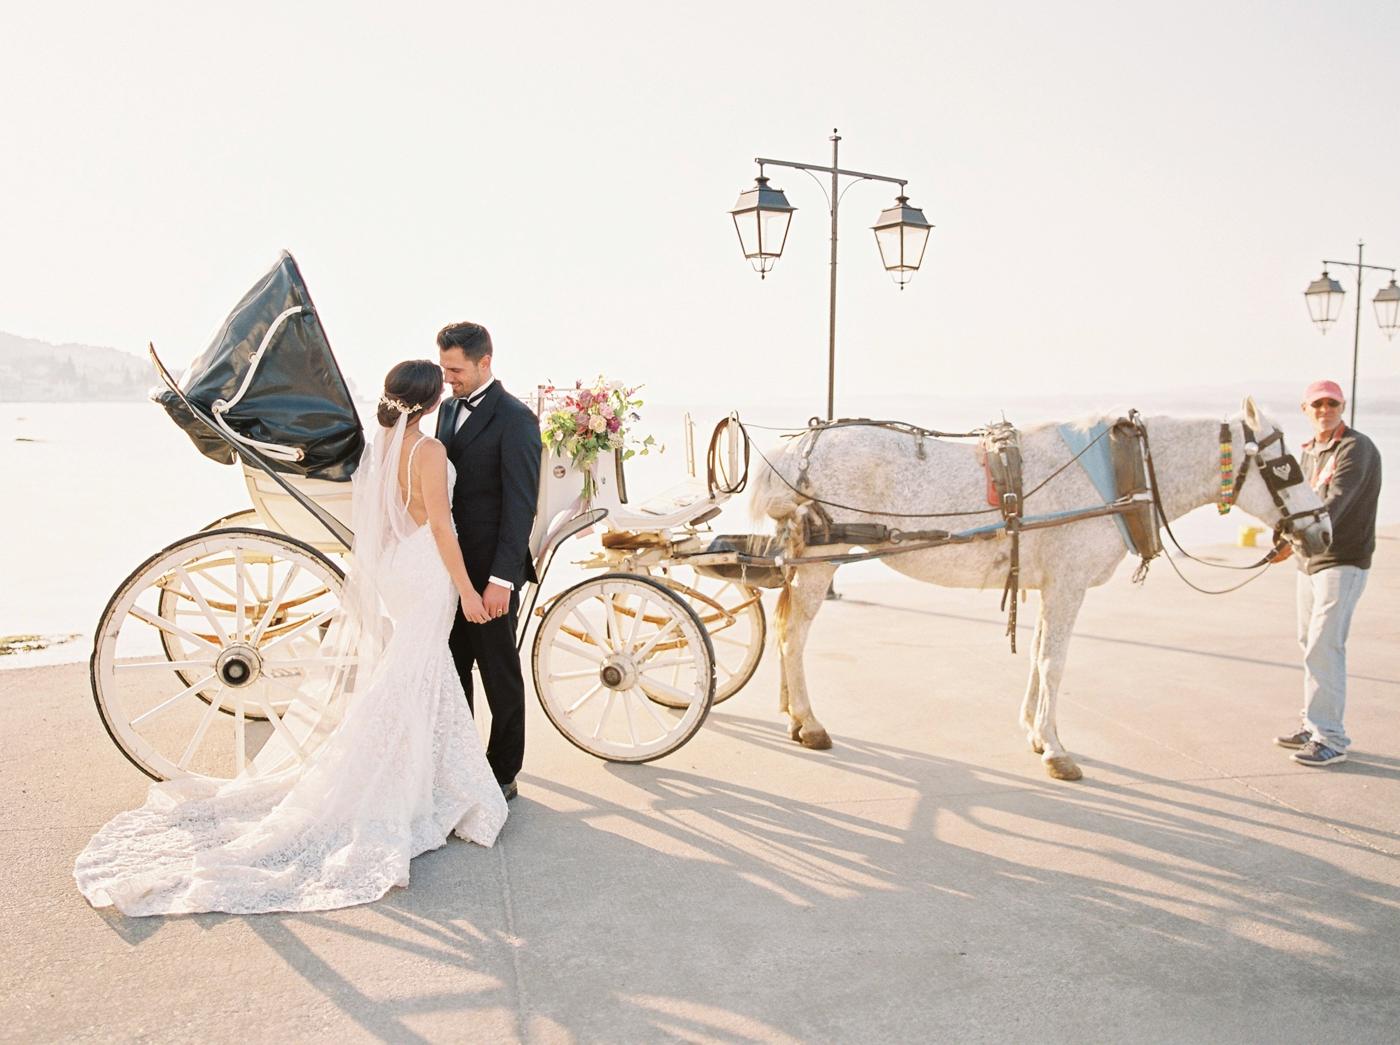 Spetses greece destination wedding photographer | Poseidonion Grand Hotel Wedding | Justine Milton fine art film photography | black and colorful glamorous wedding inspiration horse drawn carriage